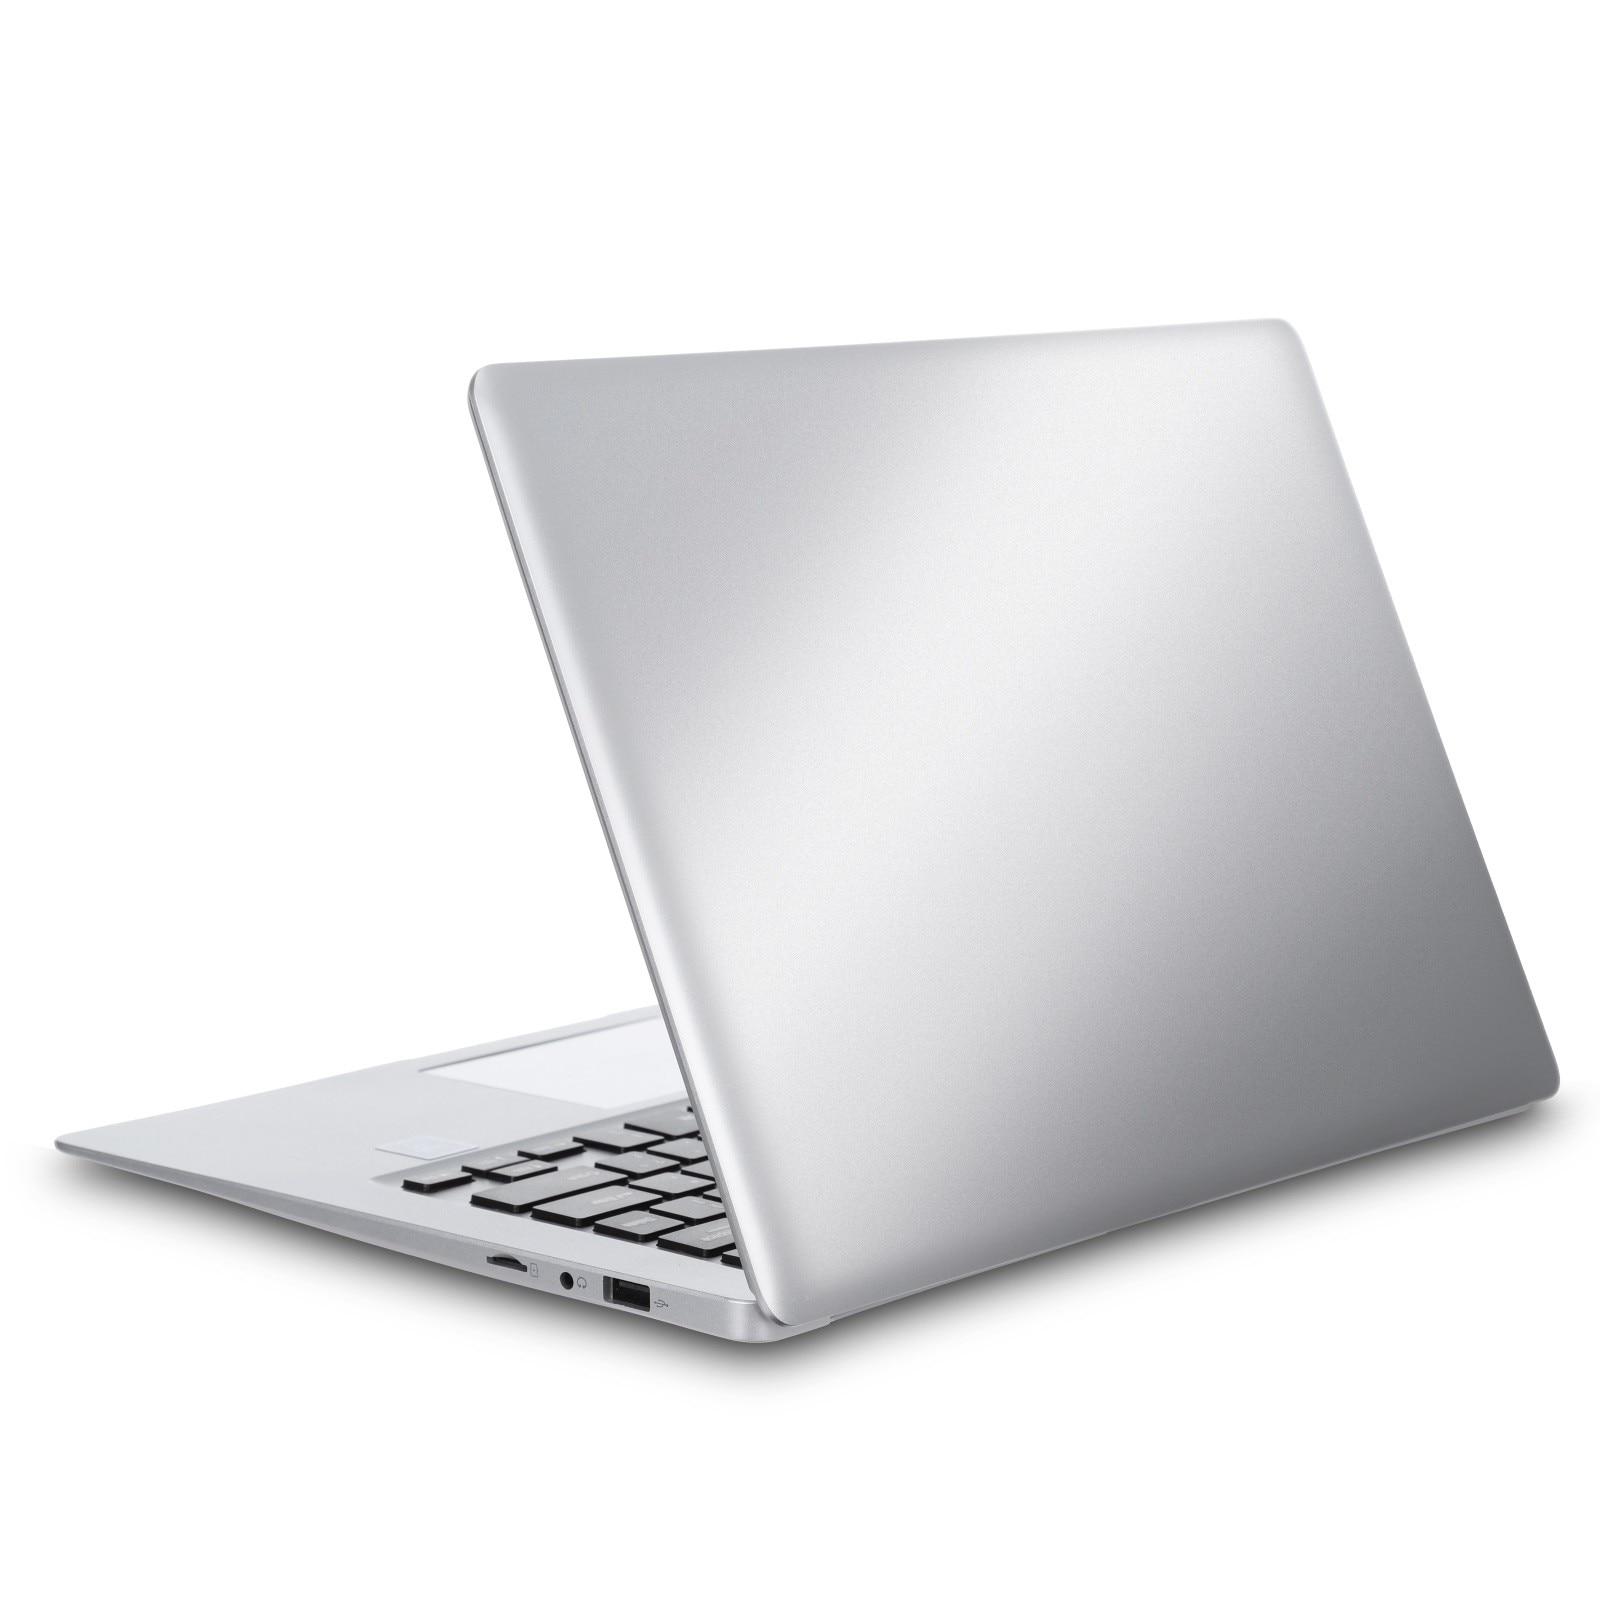 Notebook lh12 ultra-fino quad-core portátil 14 display